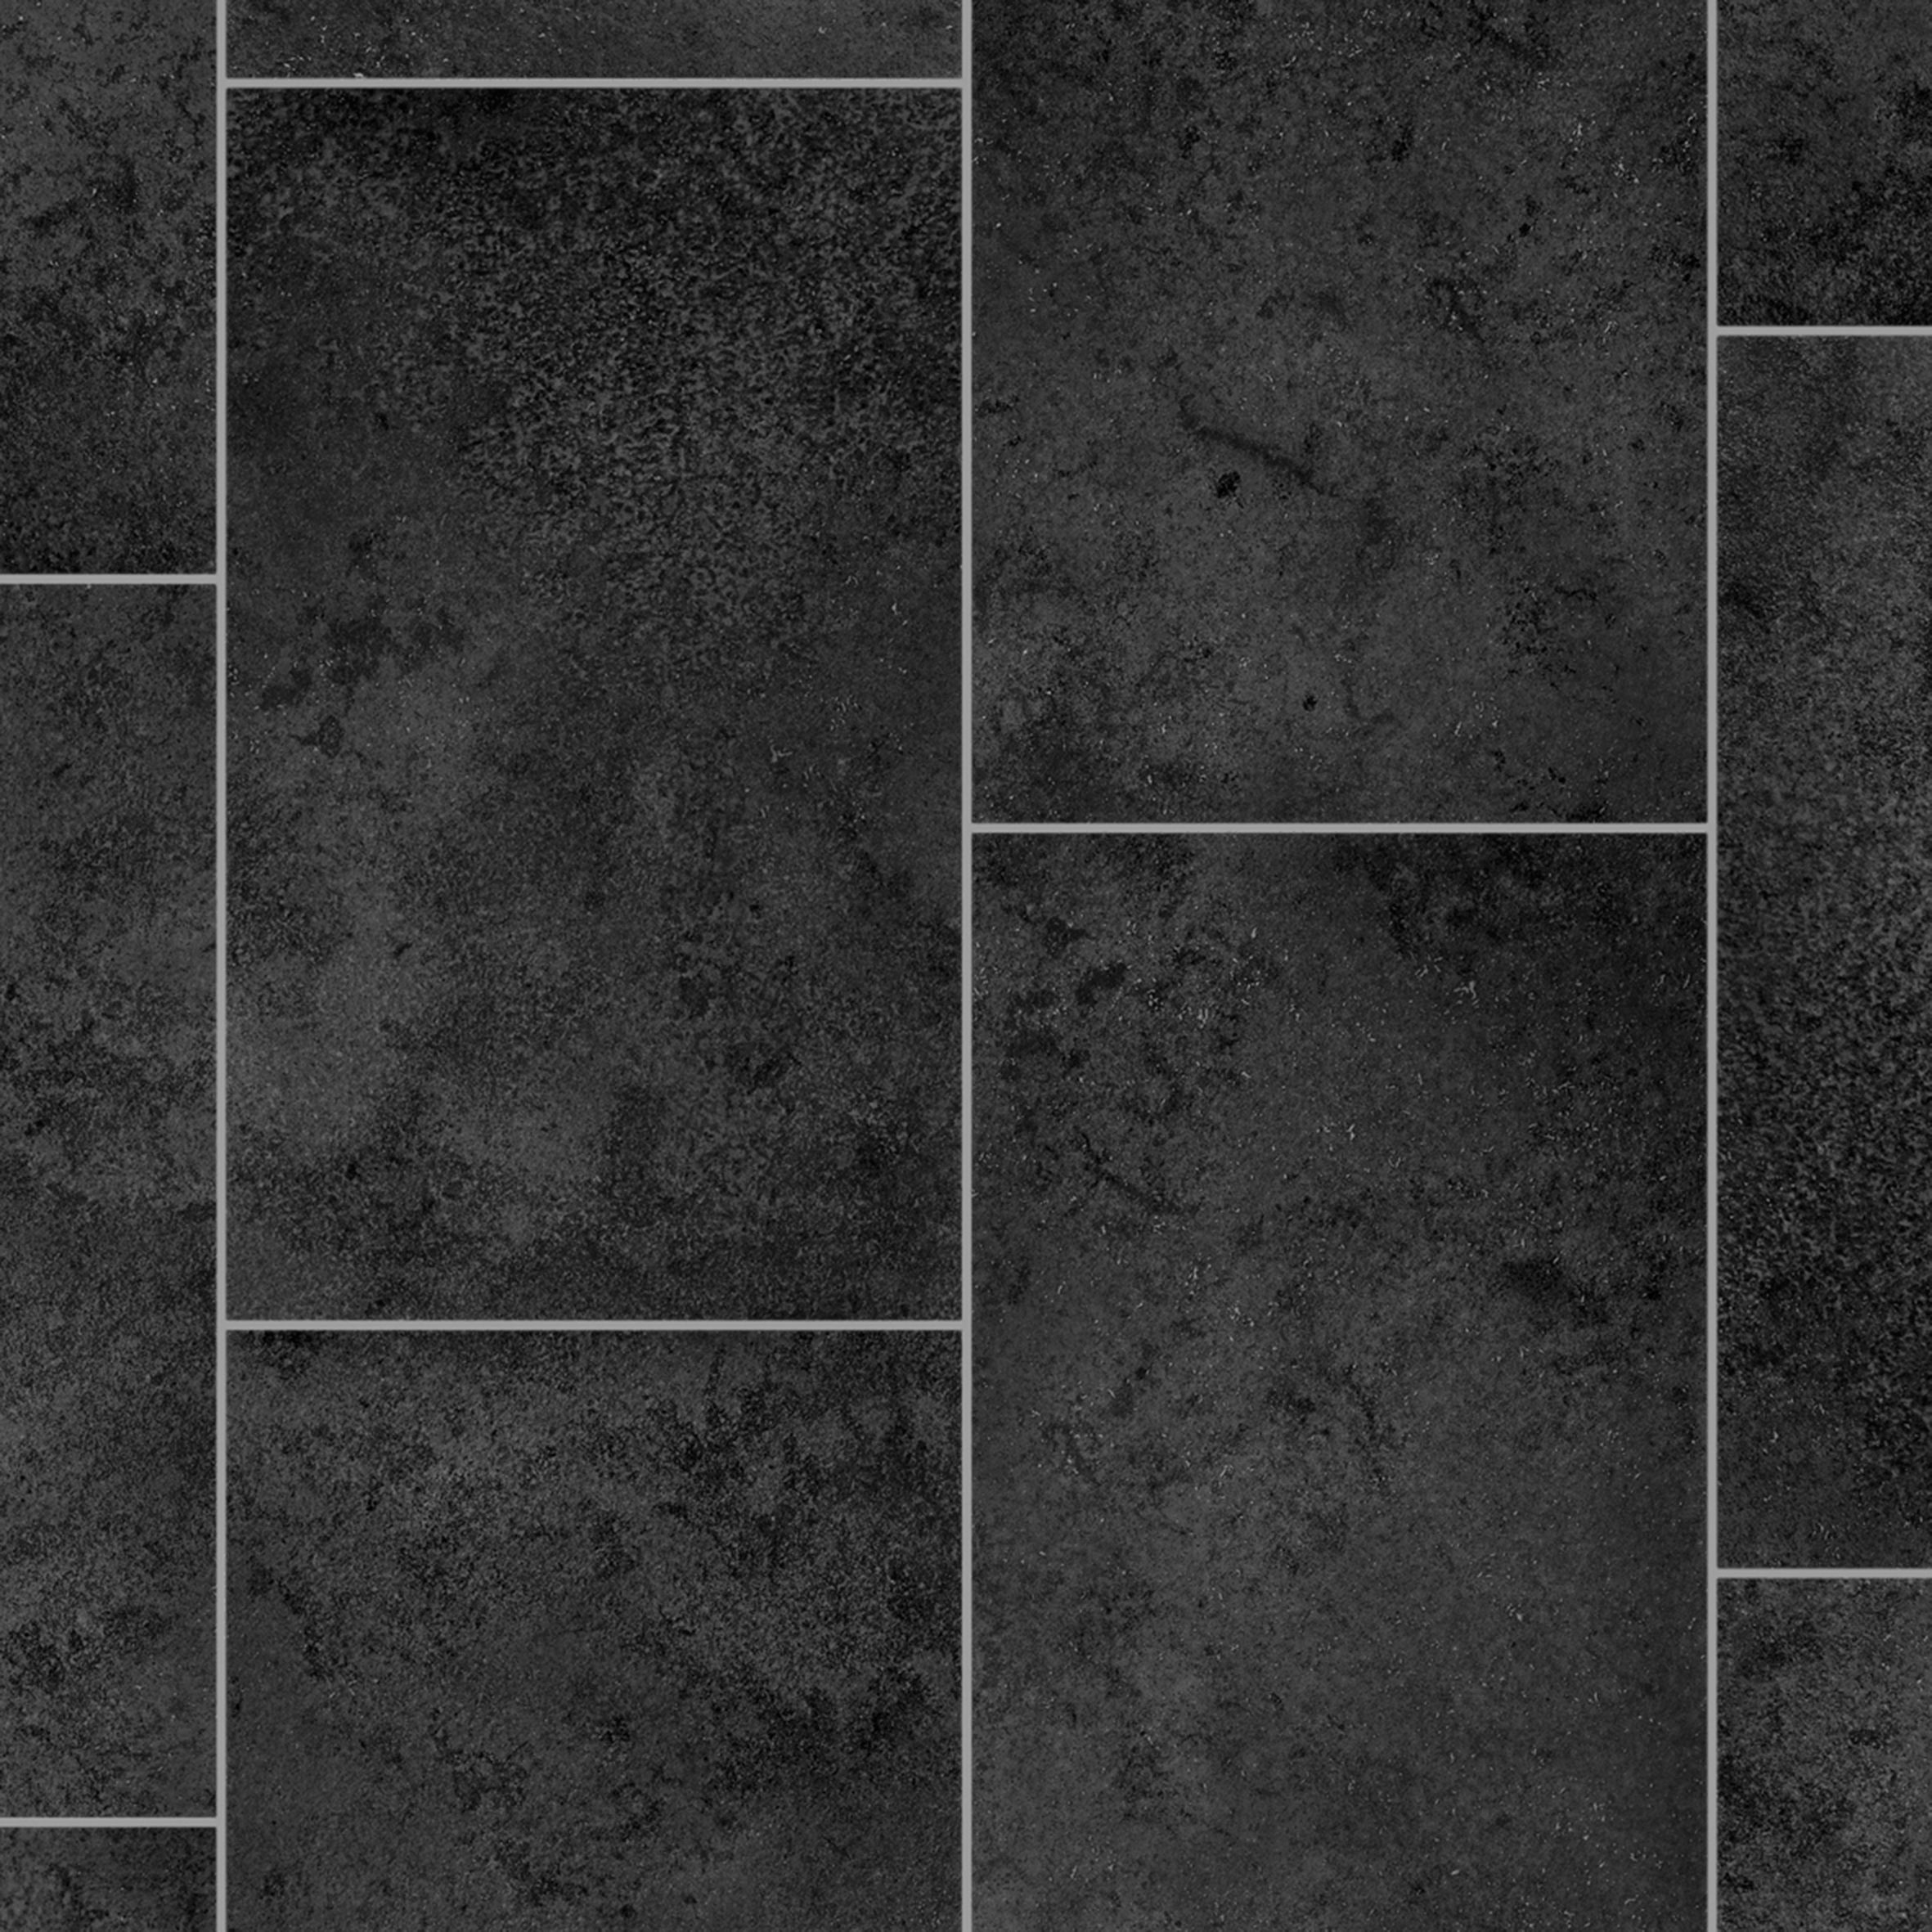 Saluzzo Black Stone Tile Effect Vinyl Cut To Chosen Length In Store